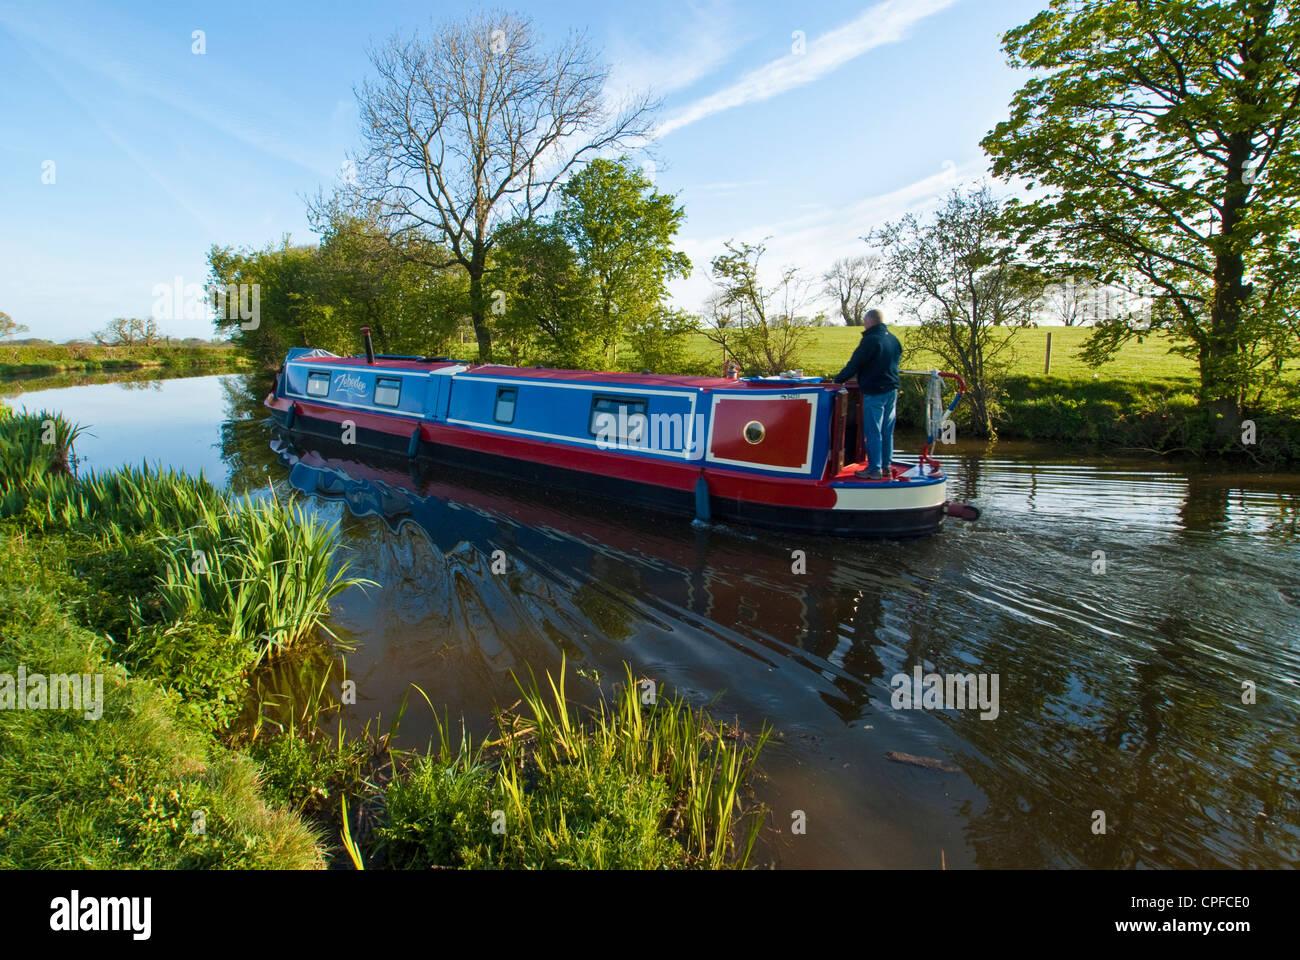 Narrowboat on the Lancaster Canal near Garstang Lancashire England - Stock Image